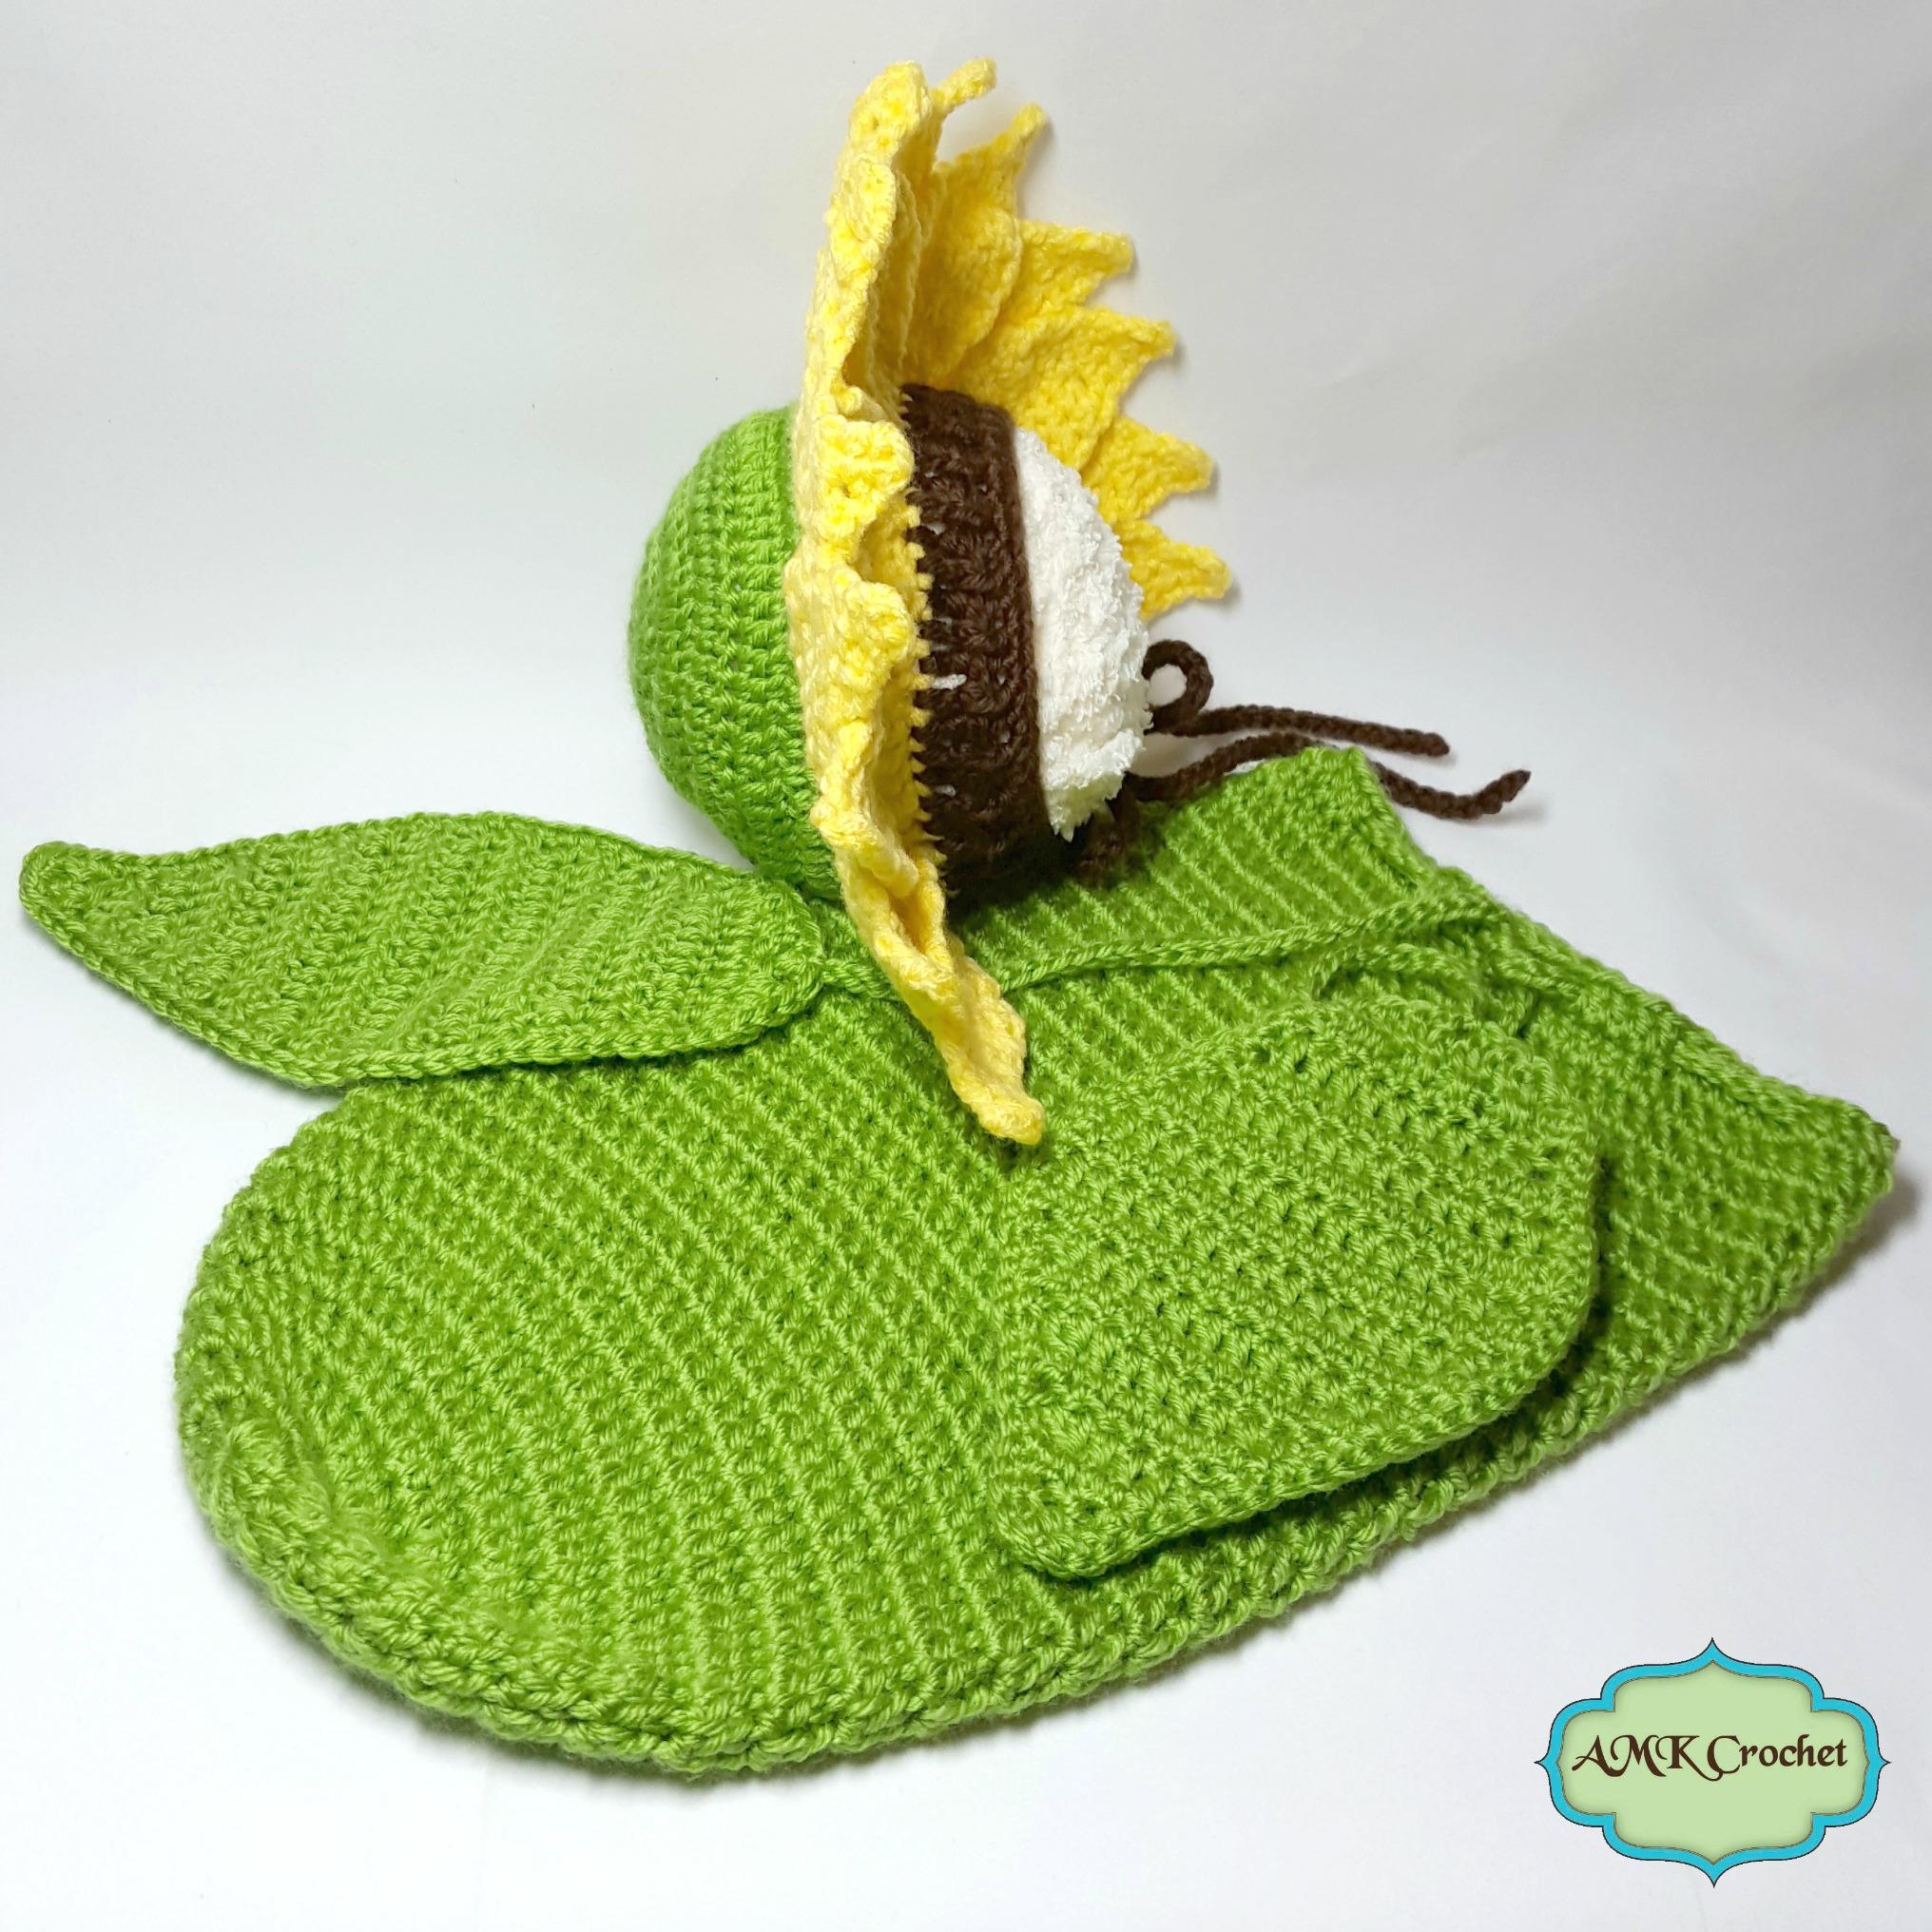 Crochet Newborn Sunflower Photo Prop Pattern AMK Crochet